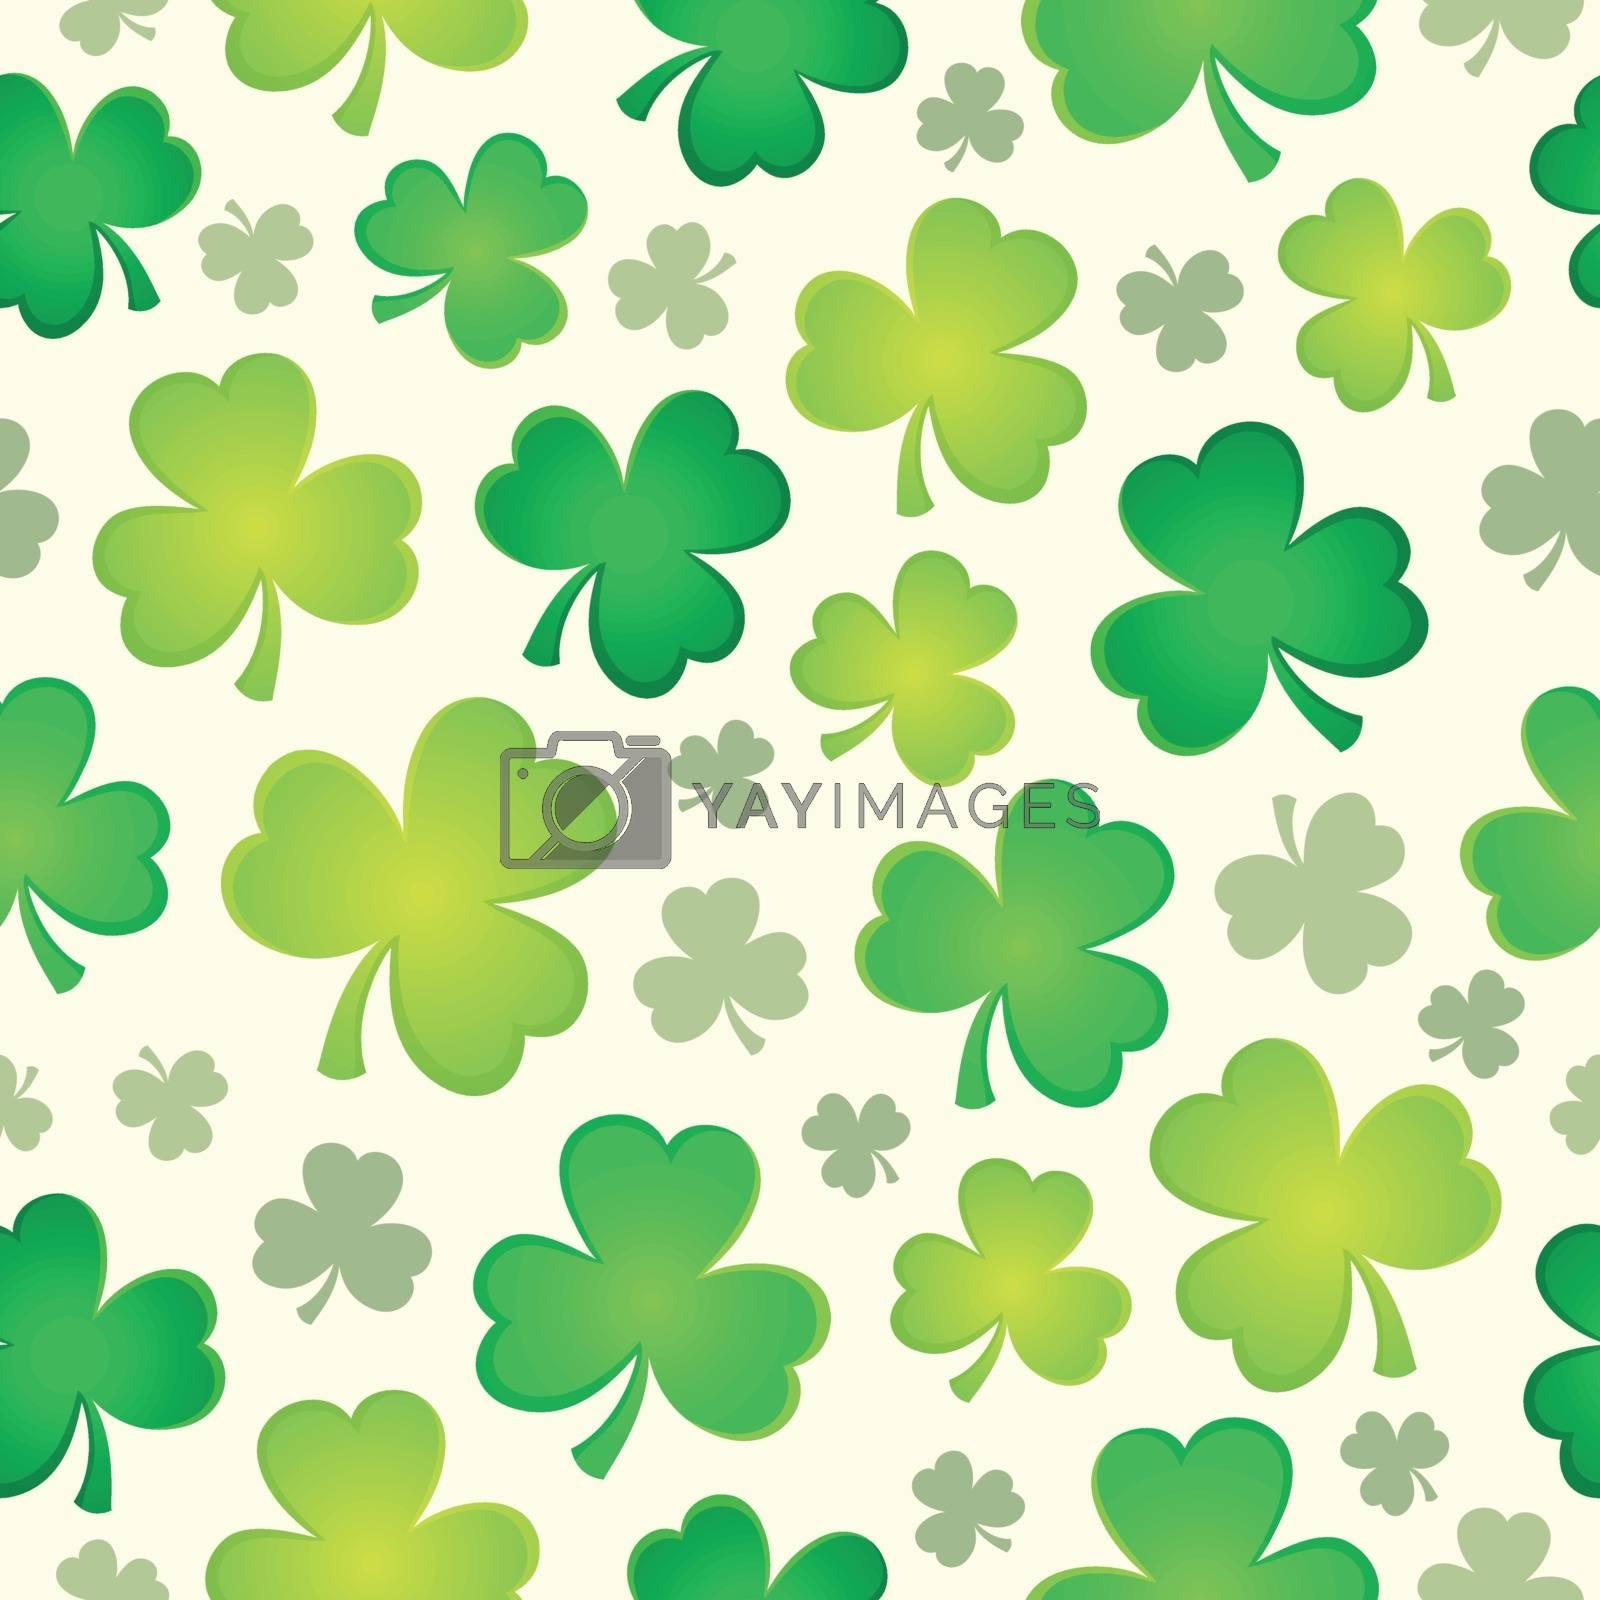 Three leaf clover seamless background 1 - eps10 vector illustration.